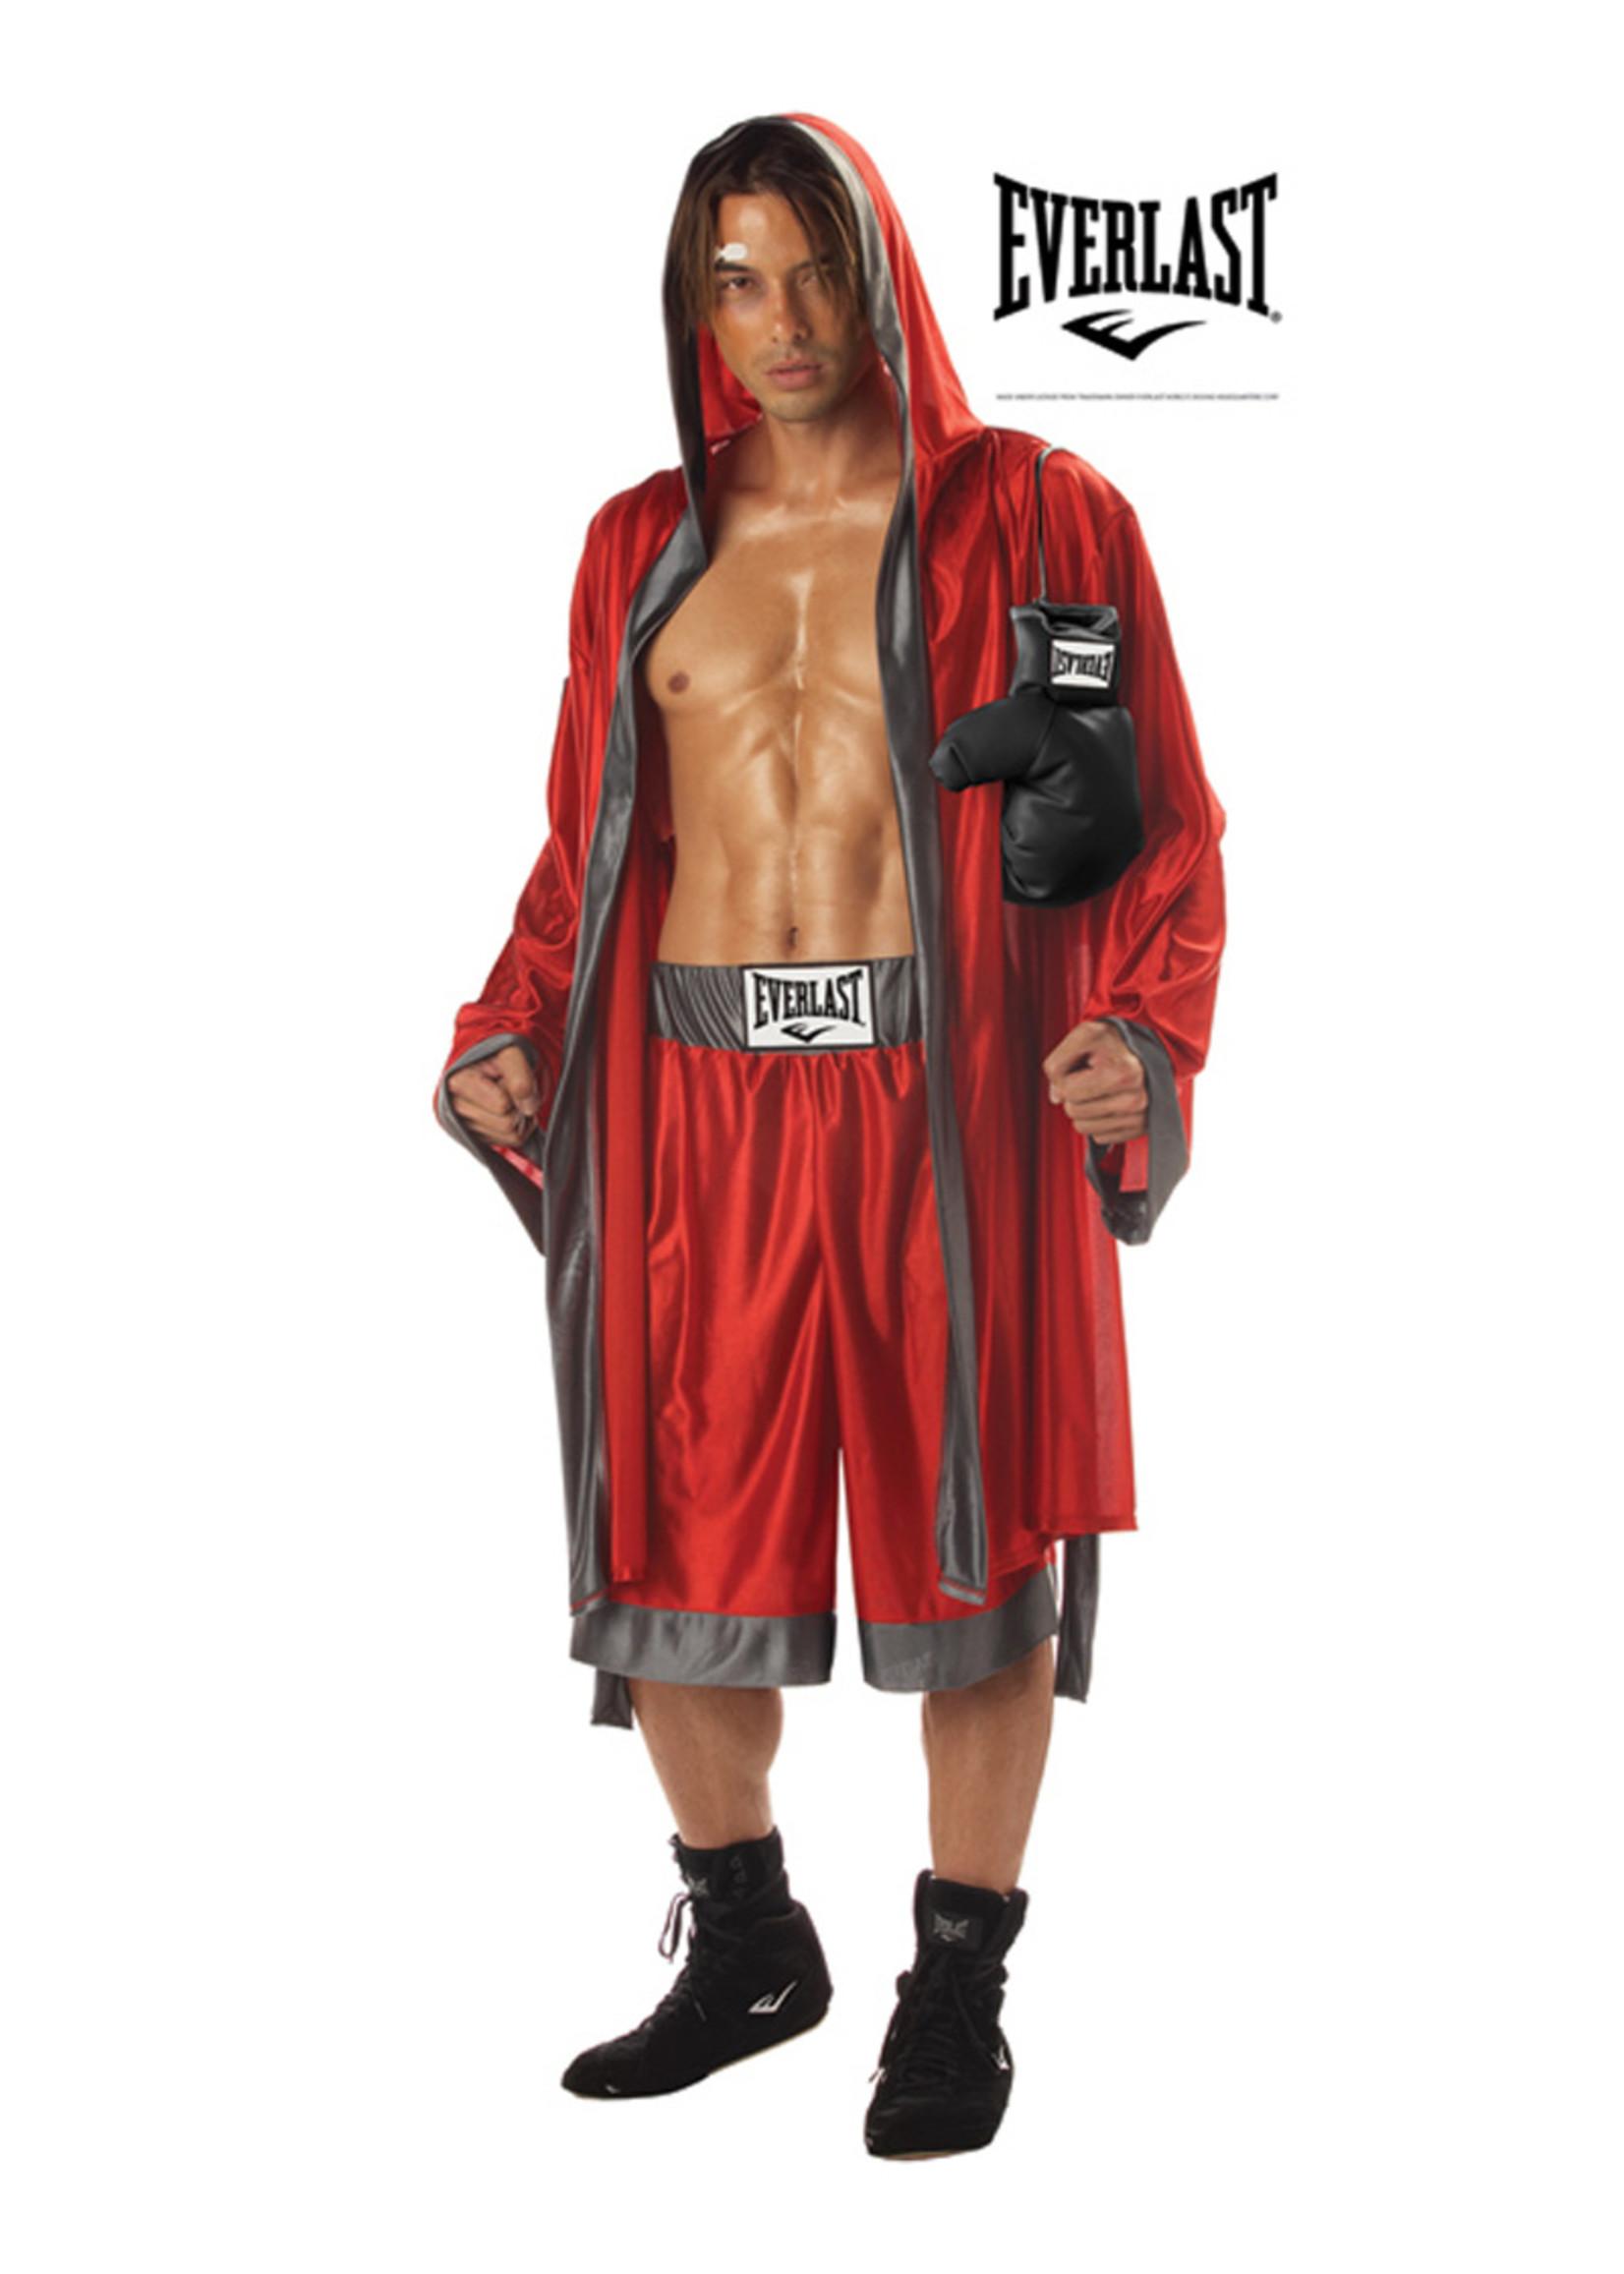 Everlast Boxer Costume - Men's